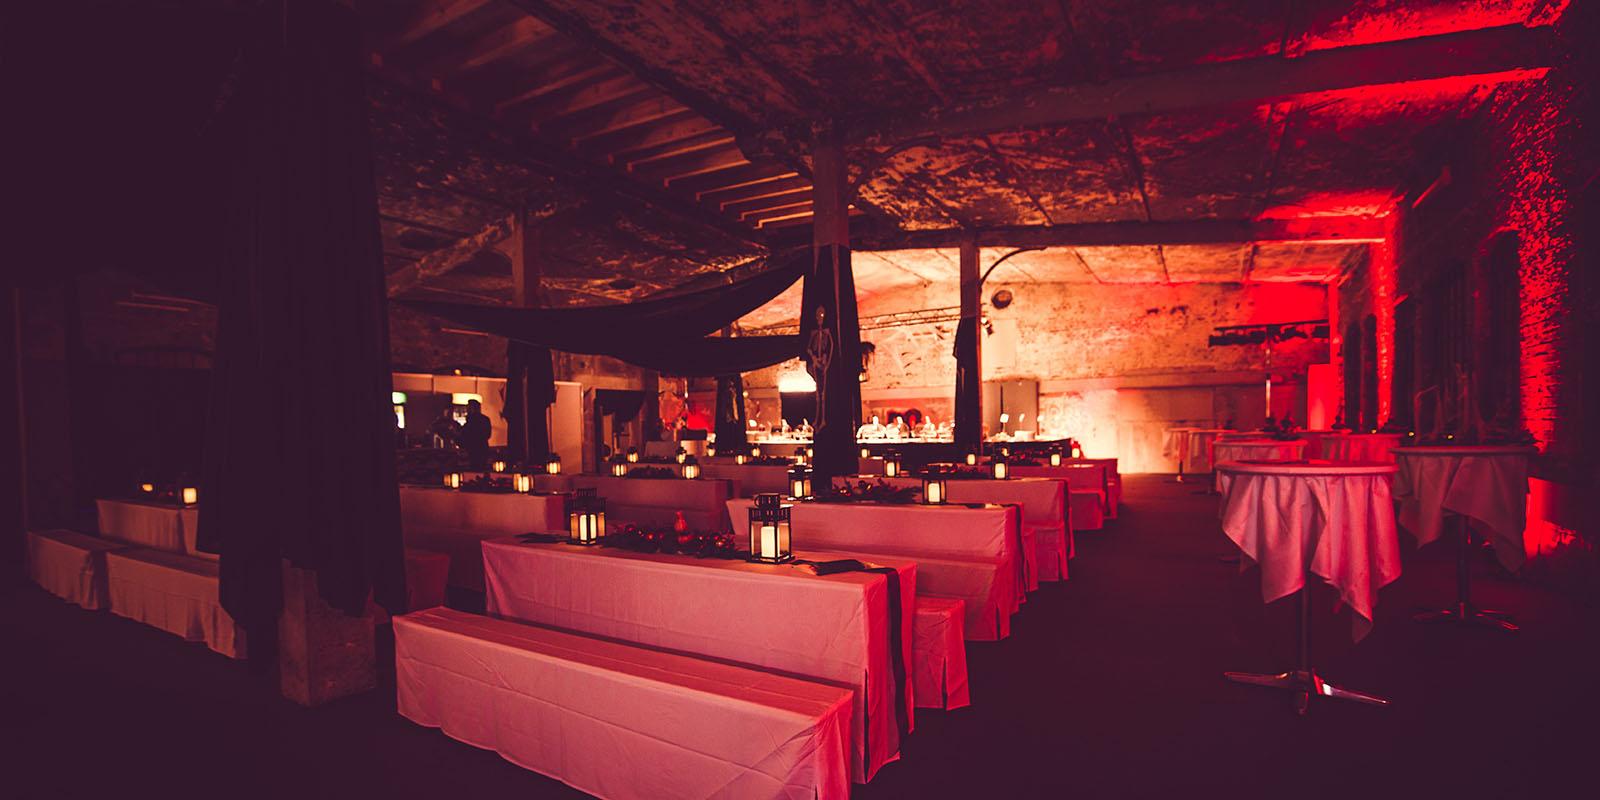 leuchtenbau-eventlocation-leipzig-eventarea-catering-gala-bankett-11